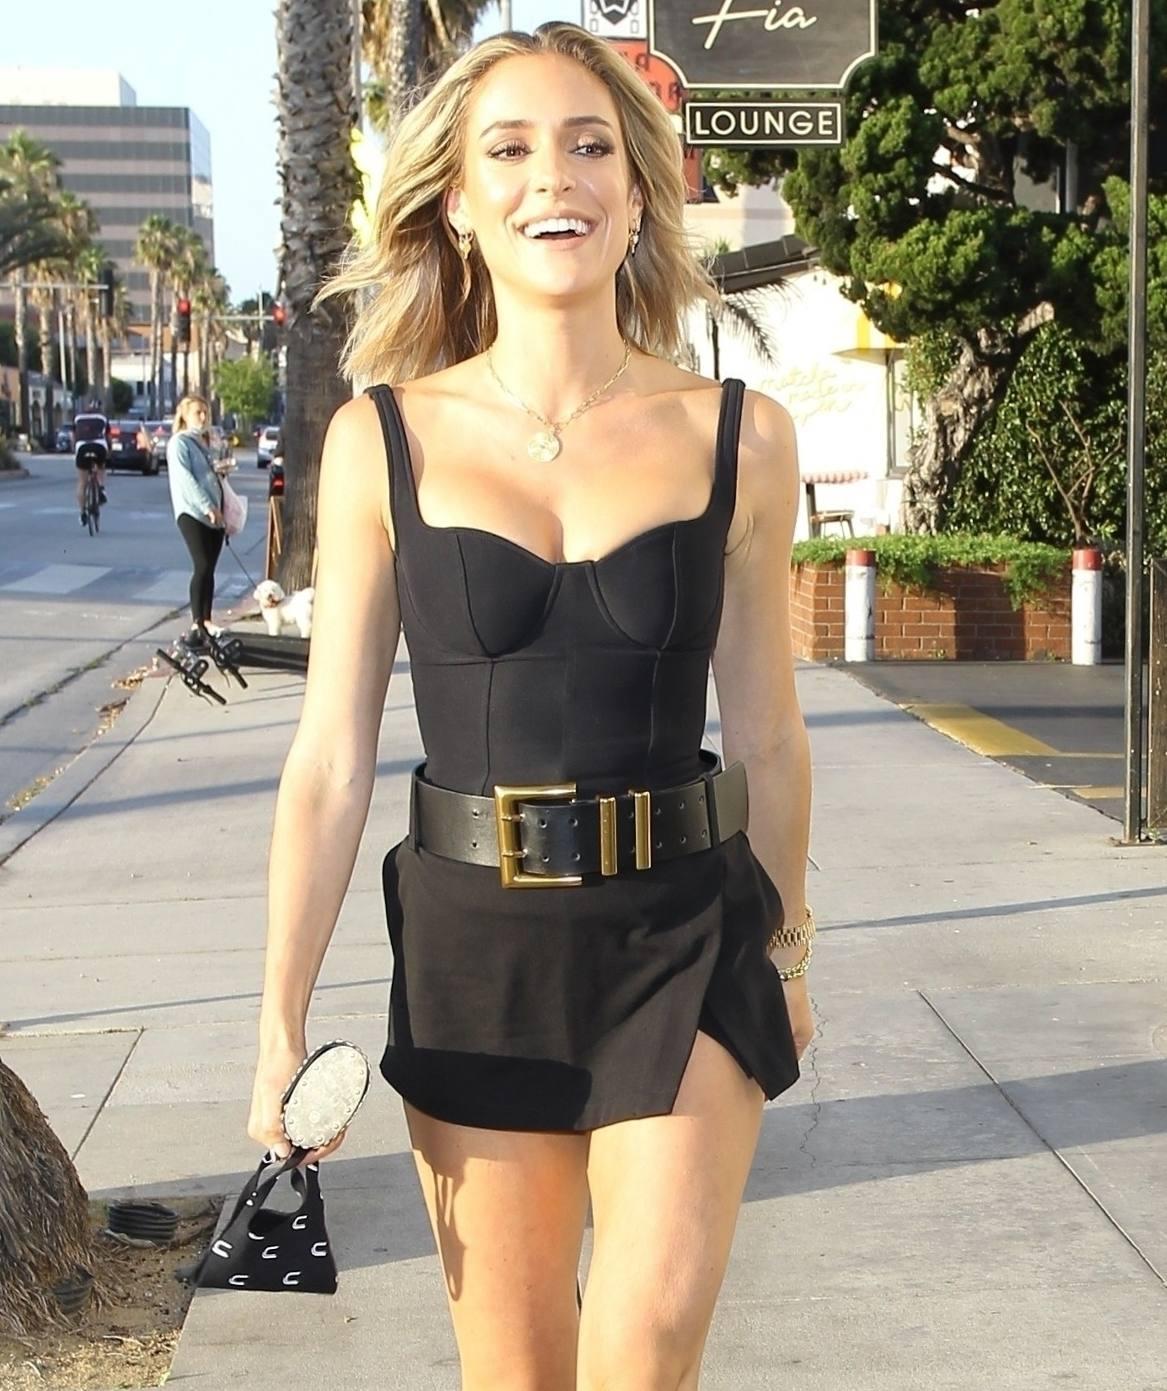 Kristin Cavallari – Sexy Legs And Beautiful Cleavage At Fia In Santa Monica 0005